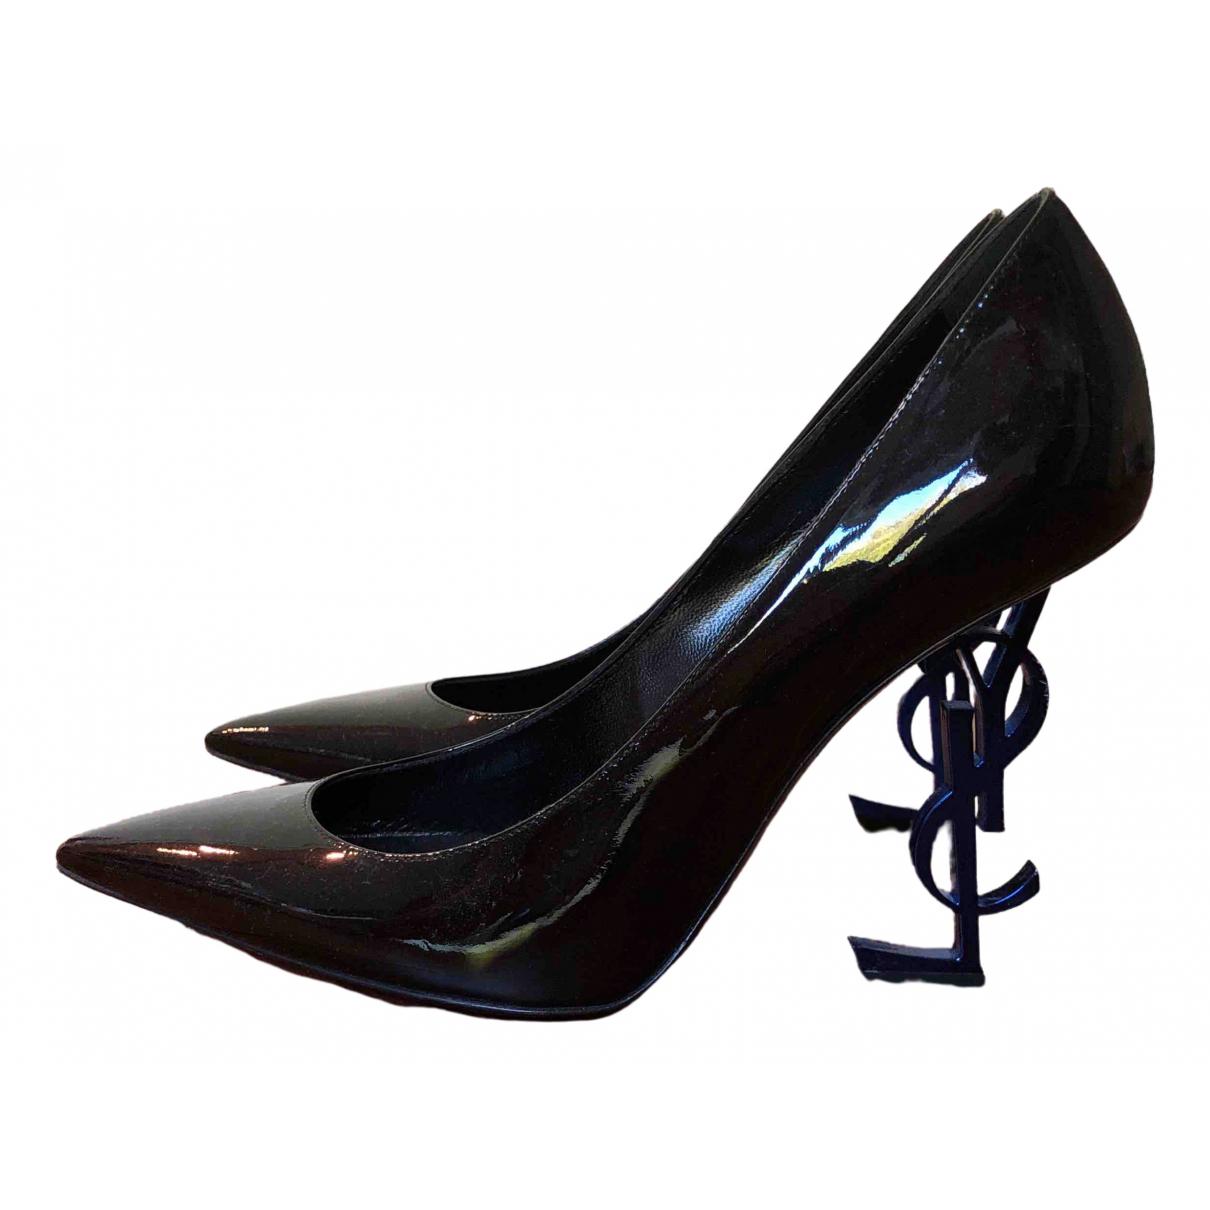 Saint Laurent Opyum Black Patent leather Heels for Women 39.5 EU